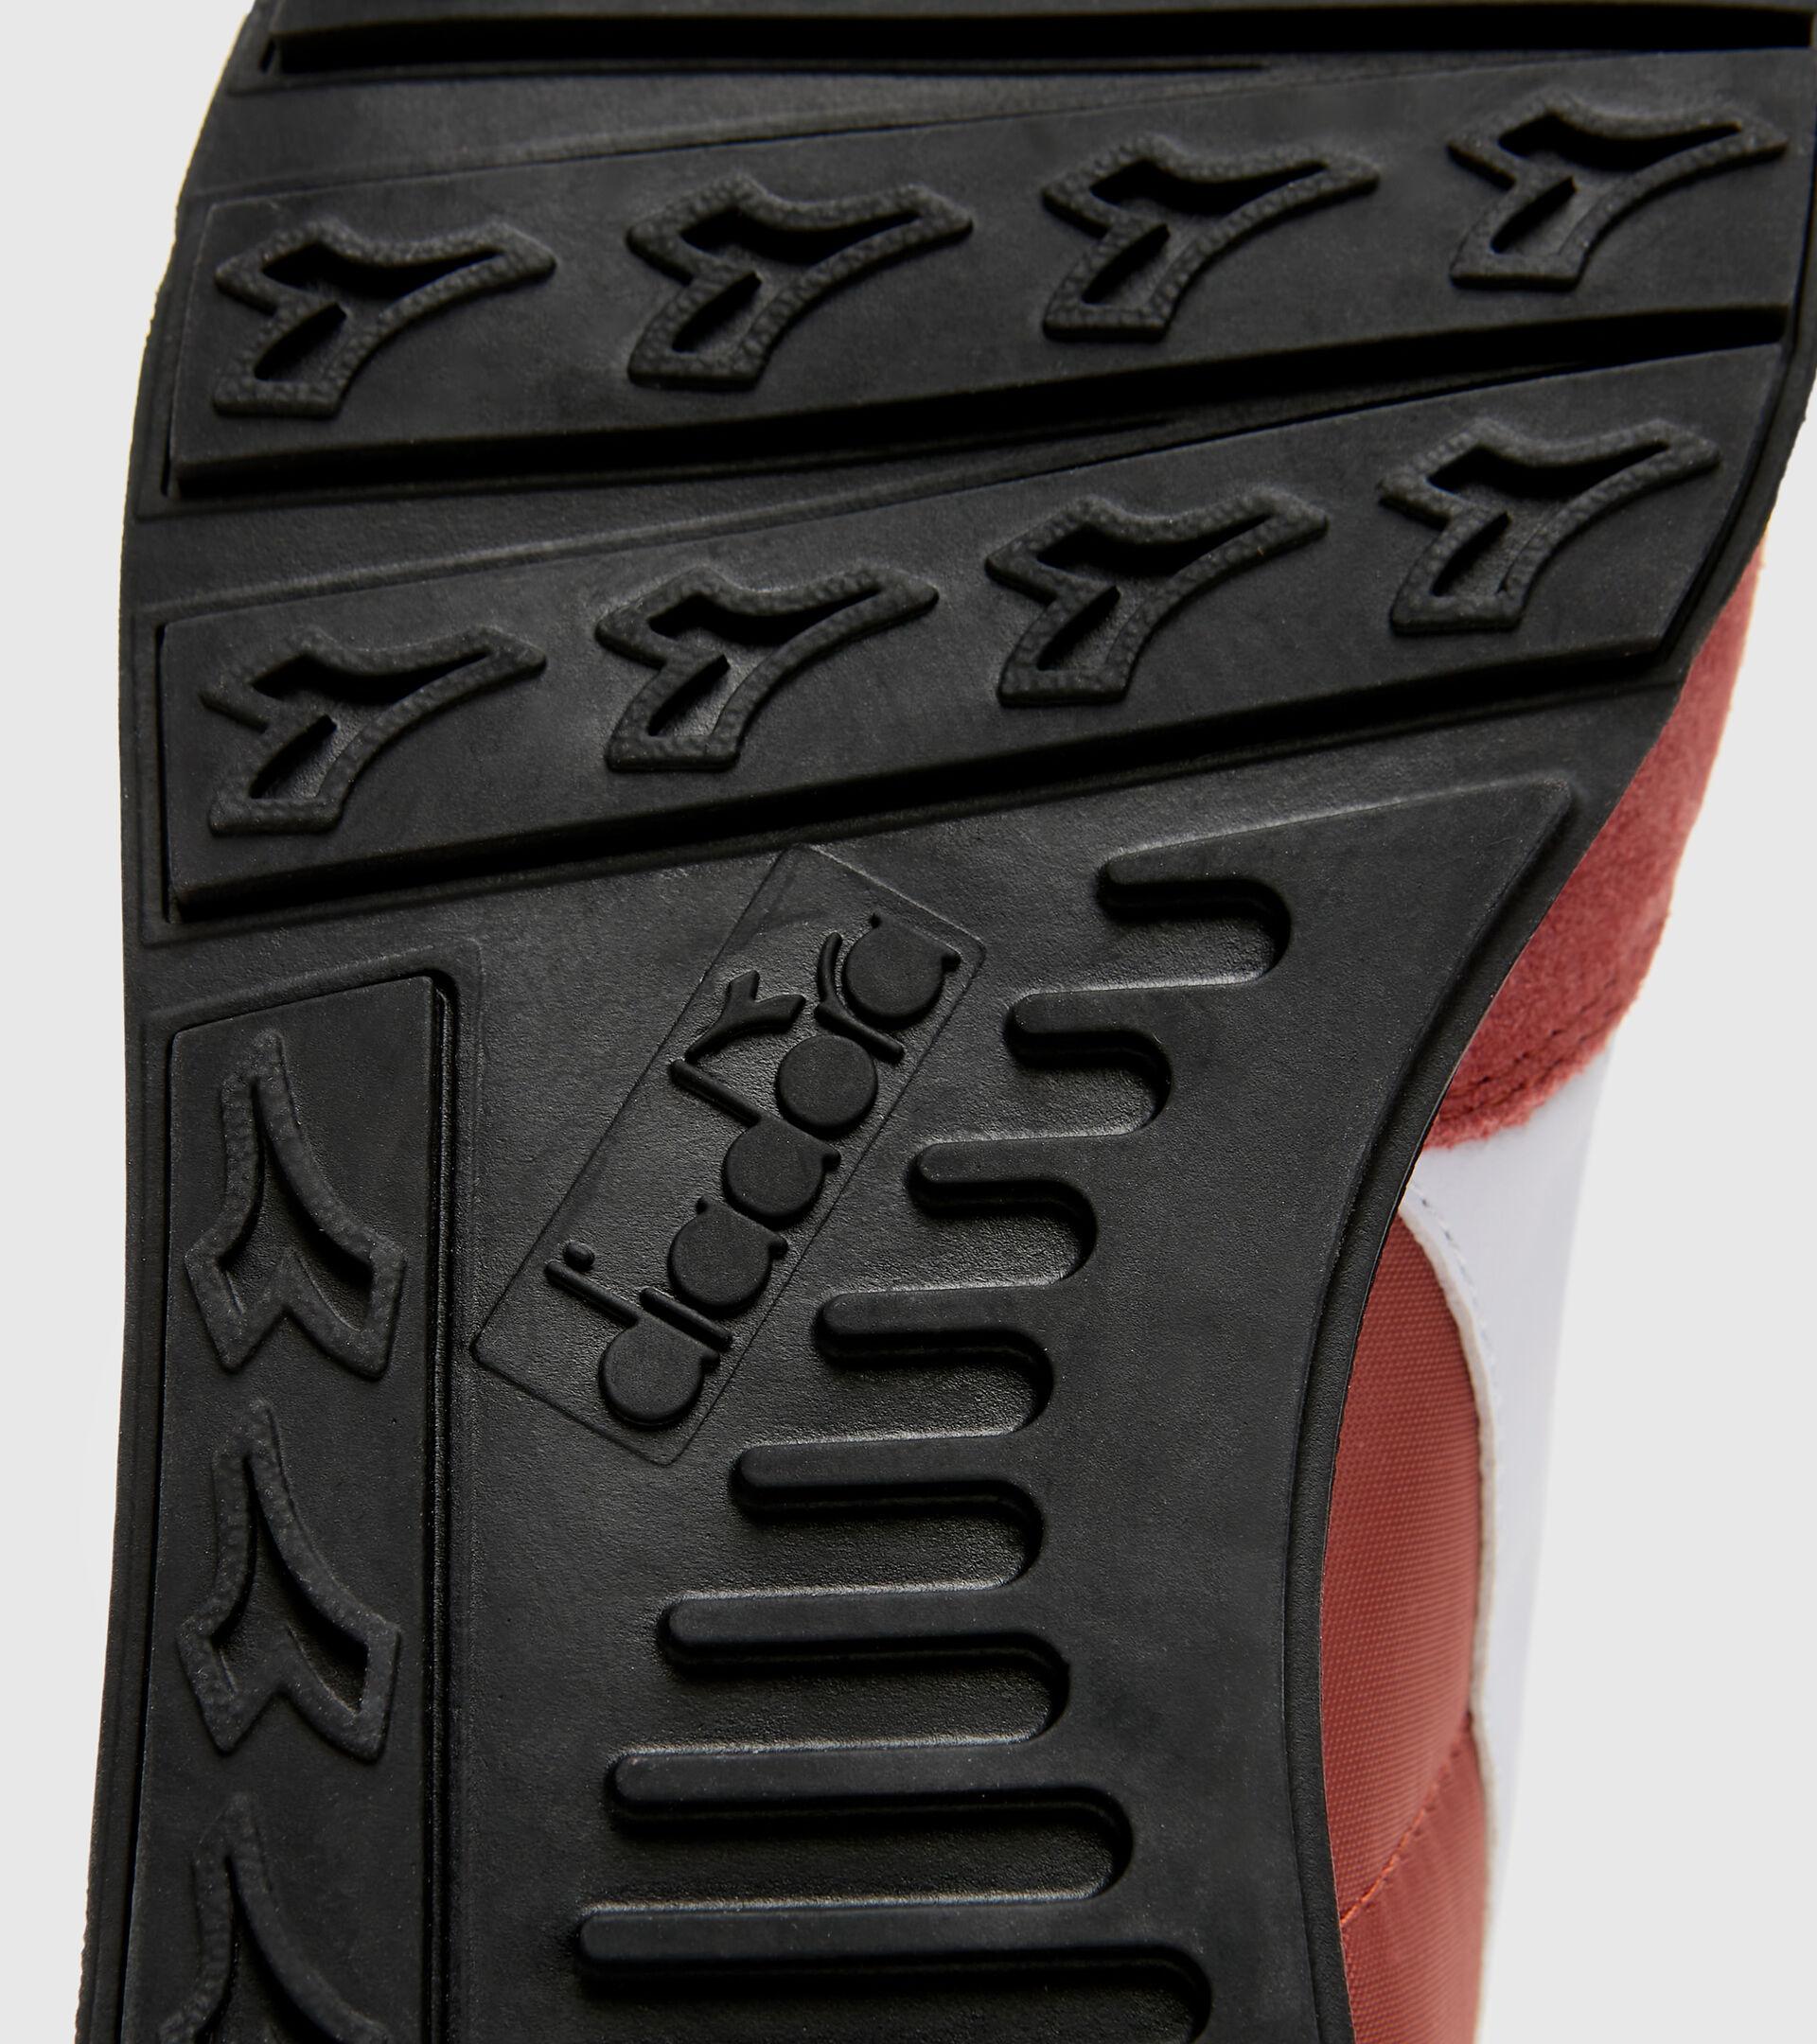 Zapatilla deportiva - Unisex CAMARO SALSA PICANTE - Diadora